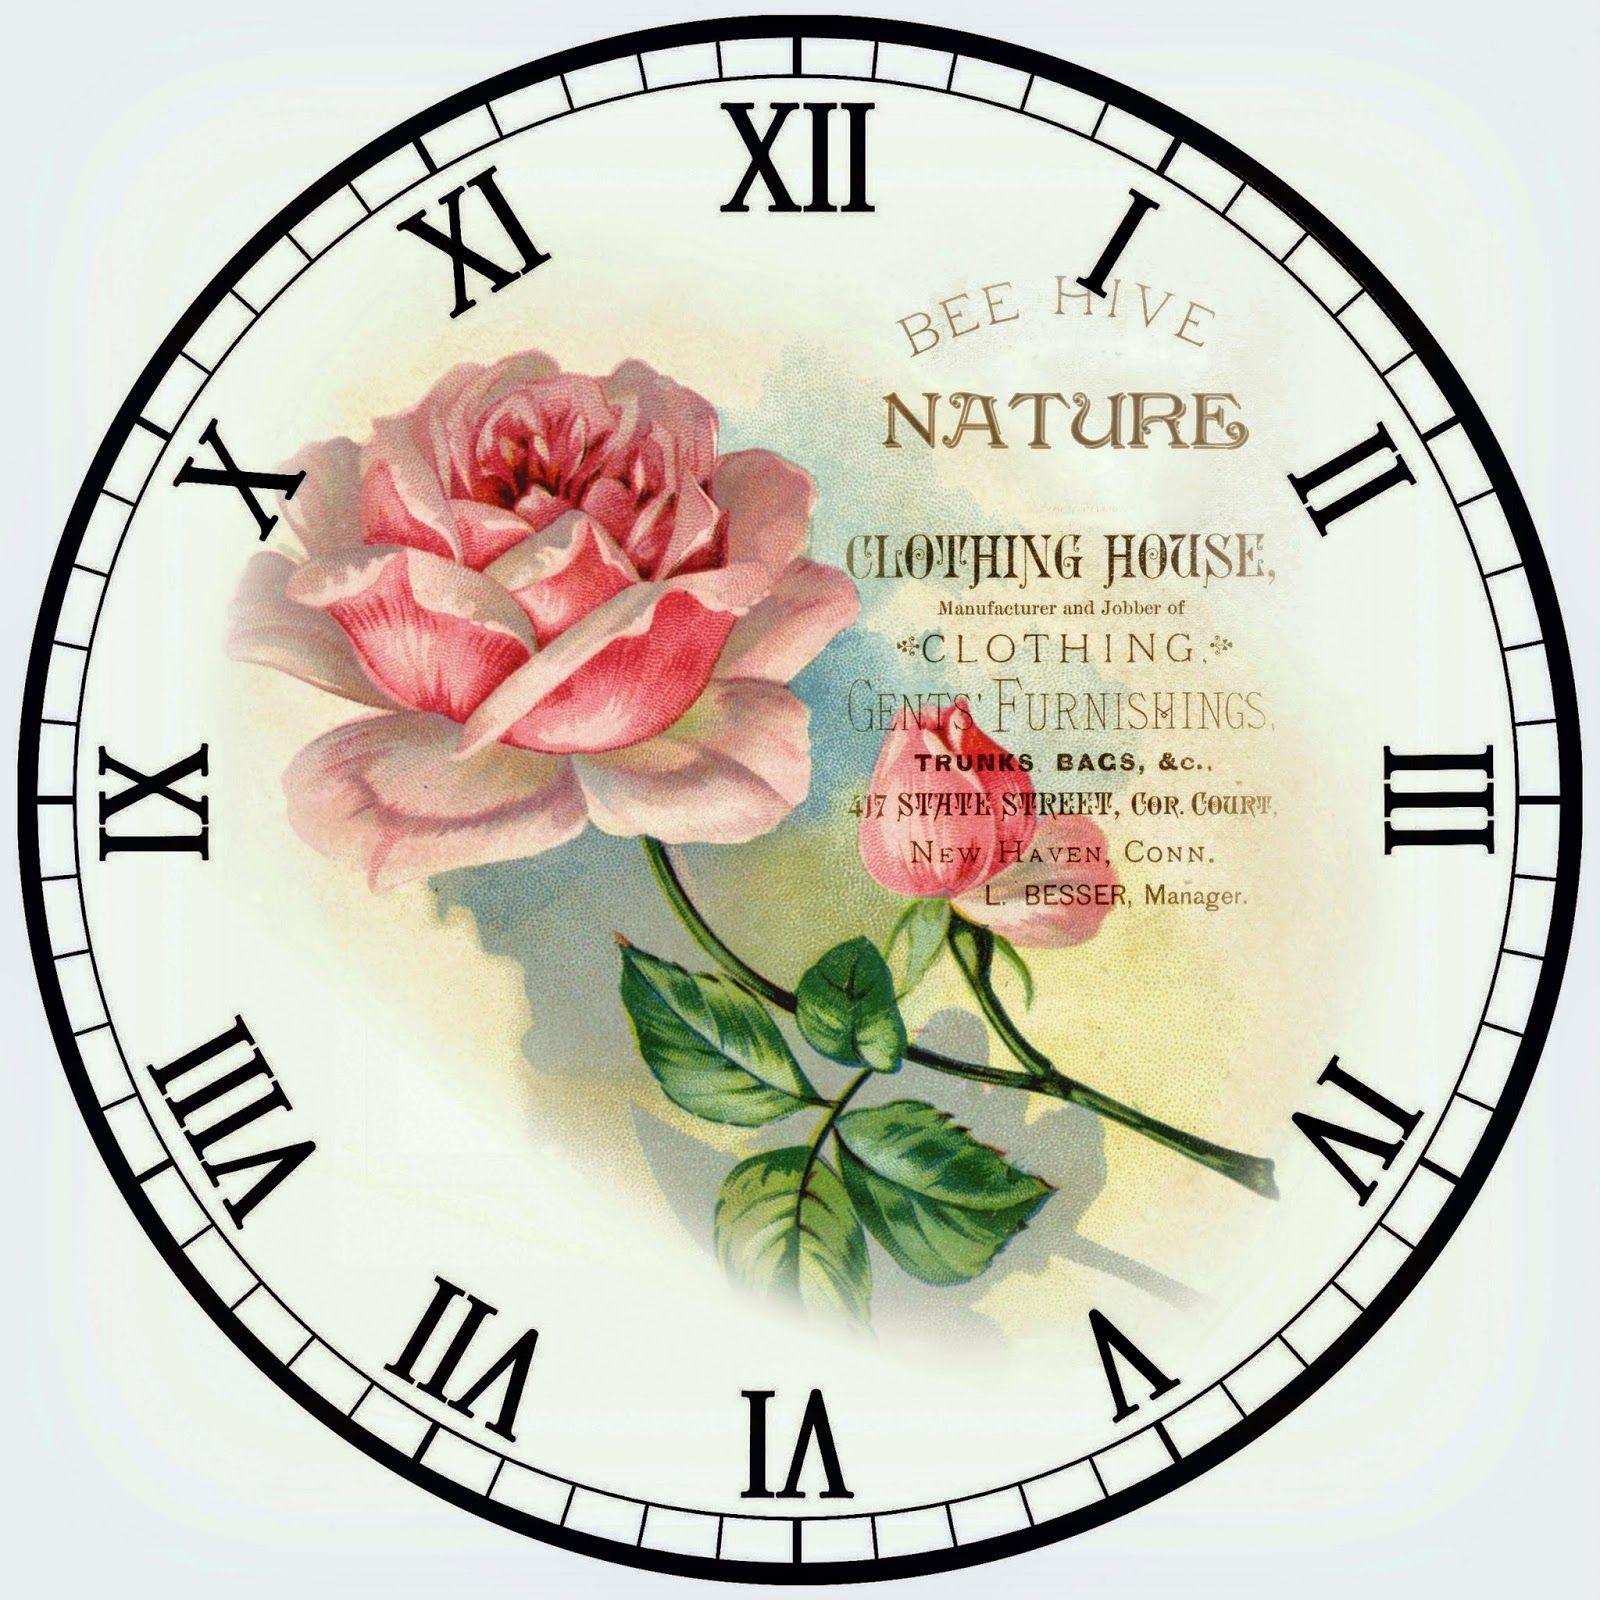 Creative clock background  Buscar con Google  relógios  Pinterest  Clock faces Clocks and